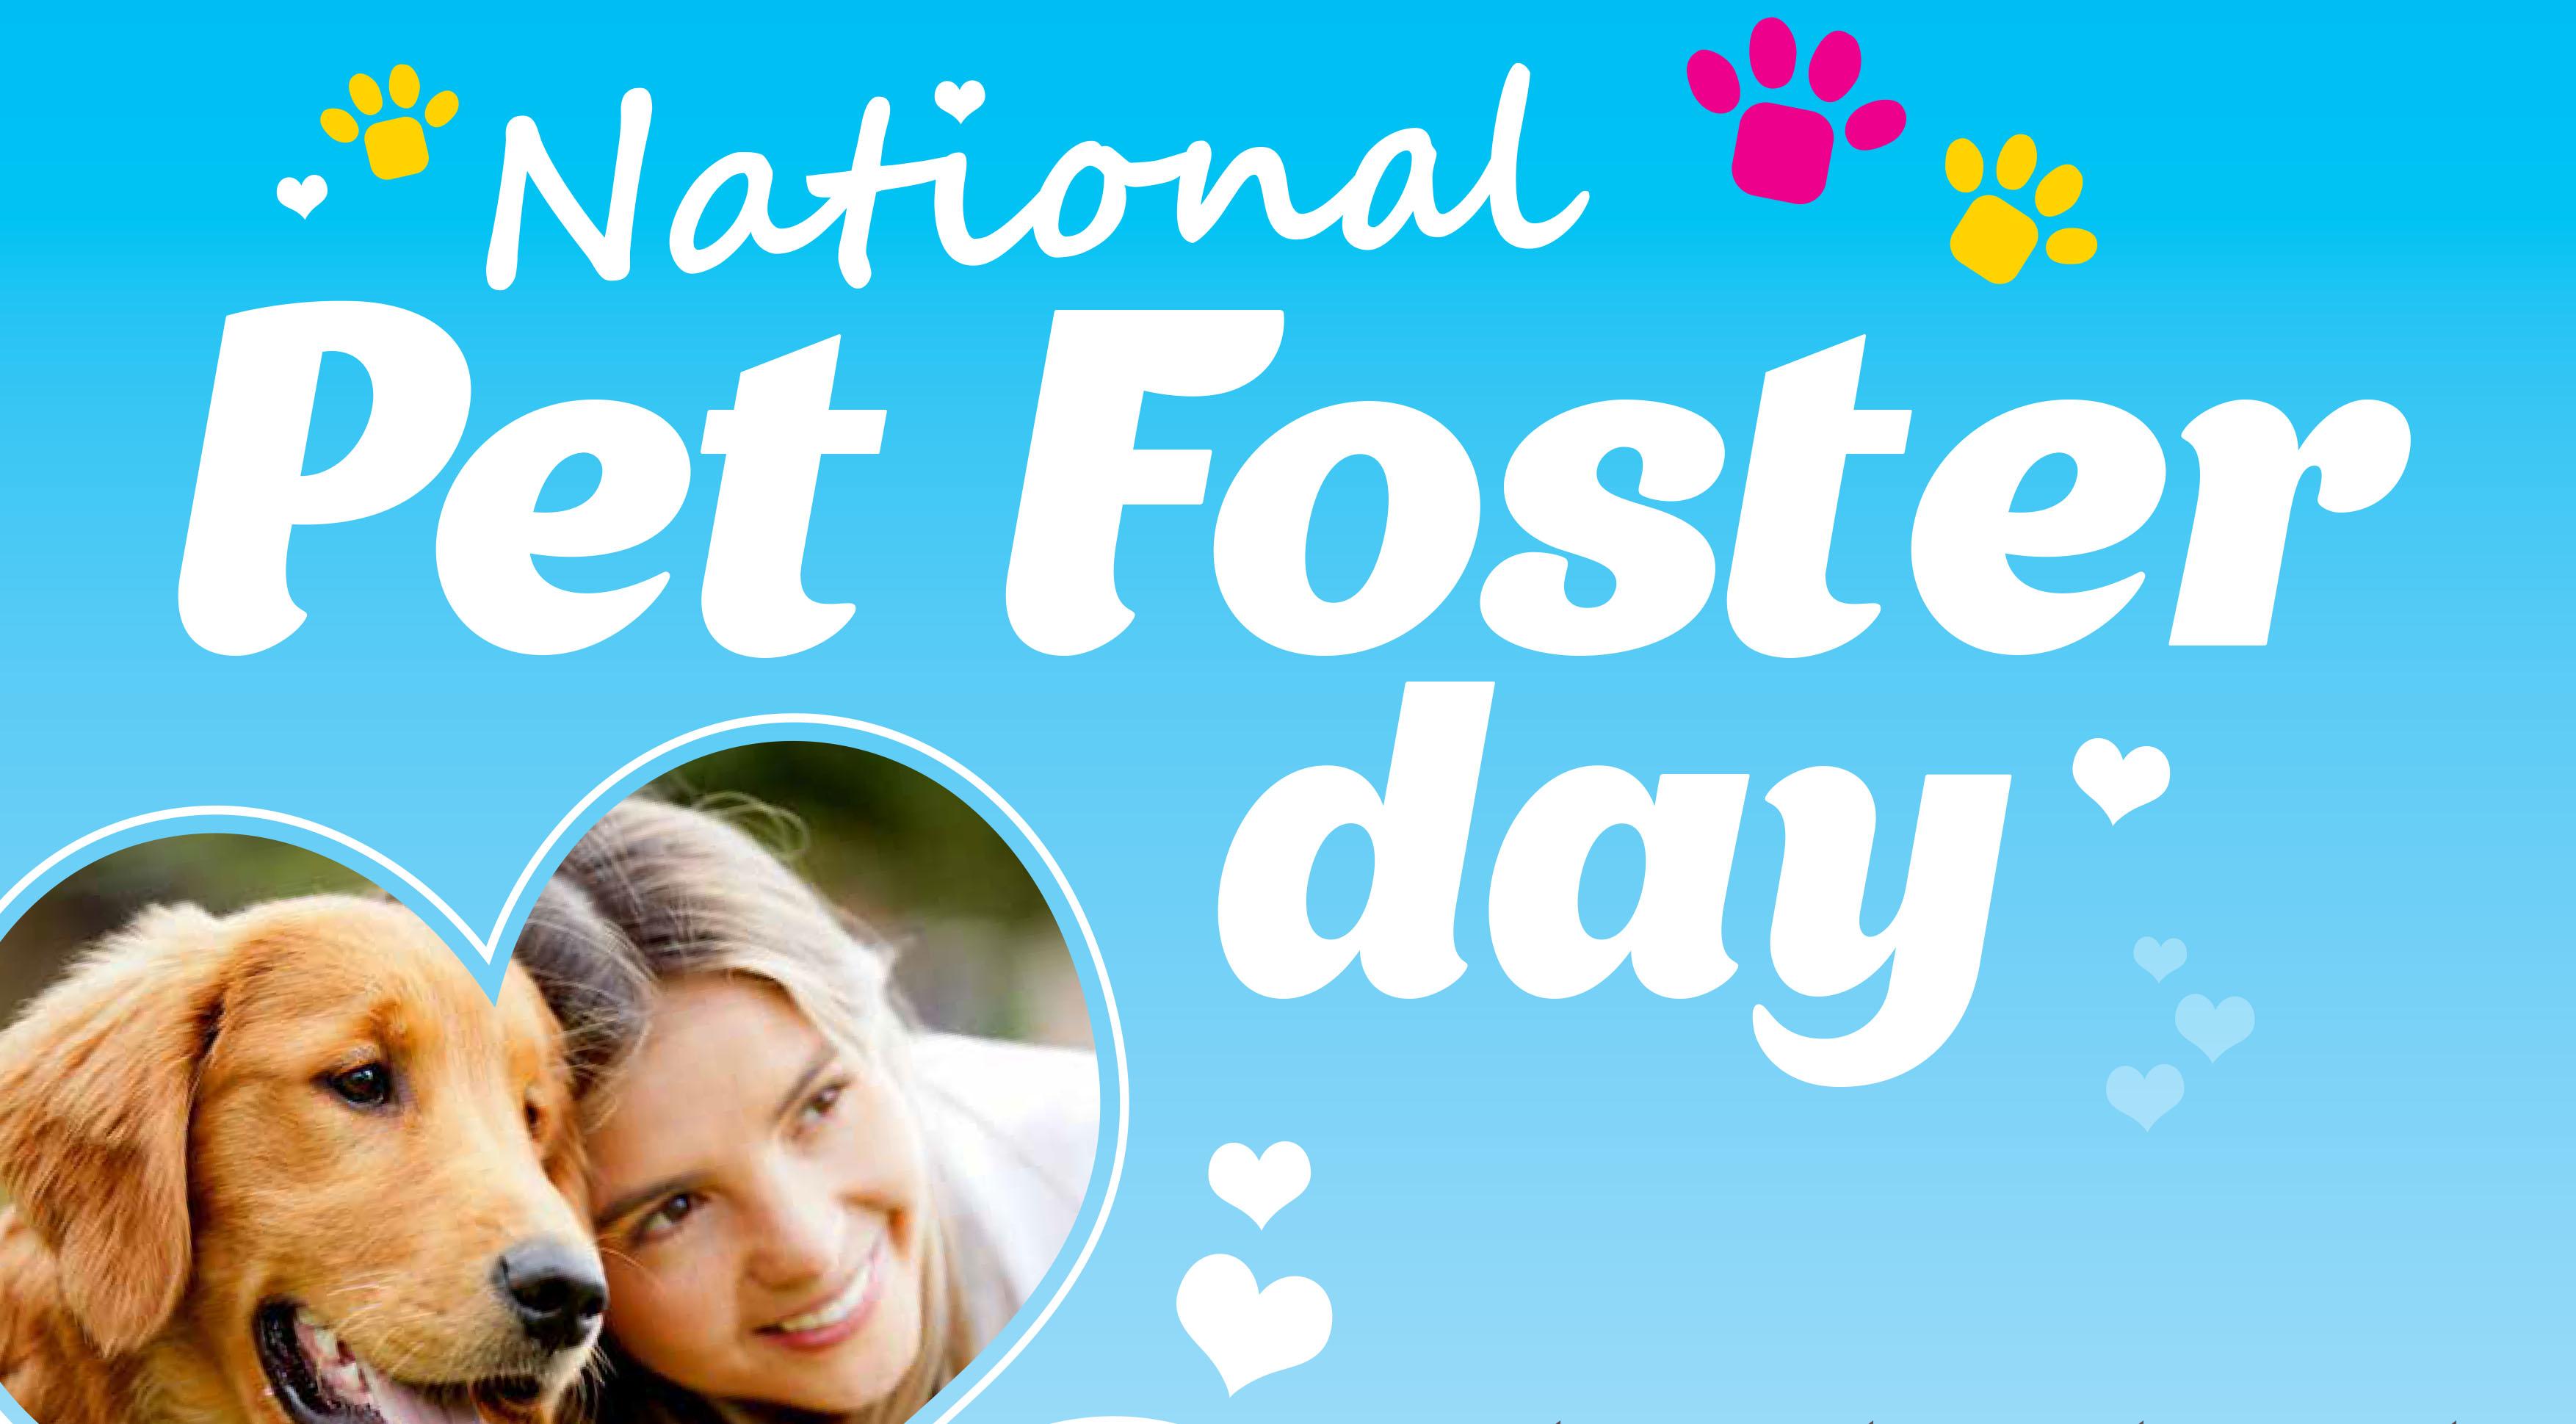 PETstock Assist National Pet Foster Day